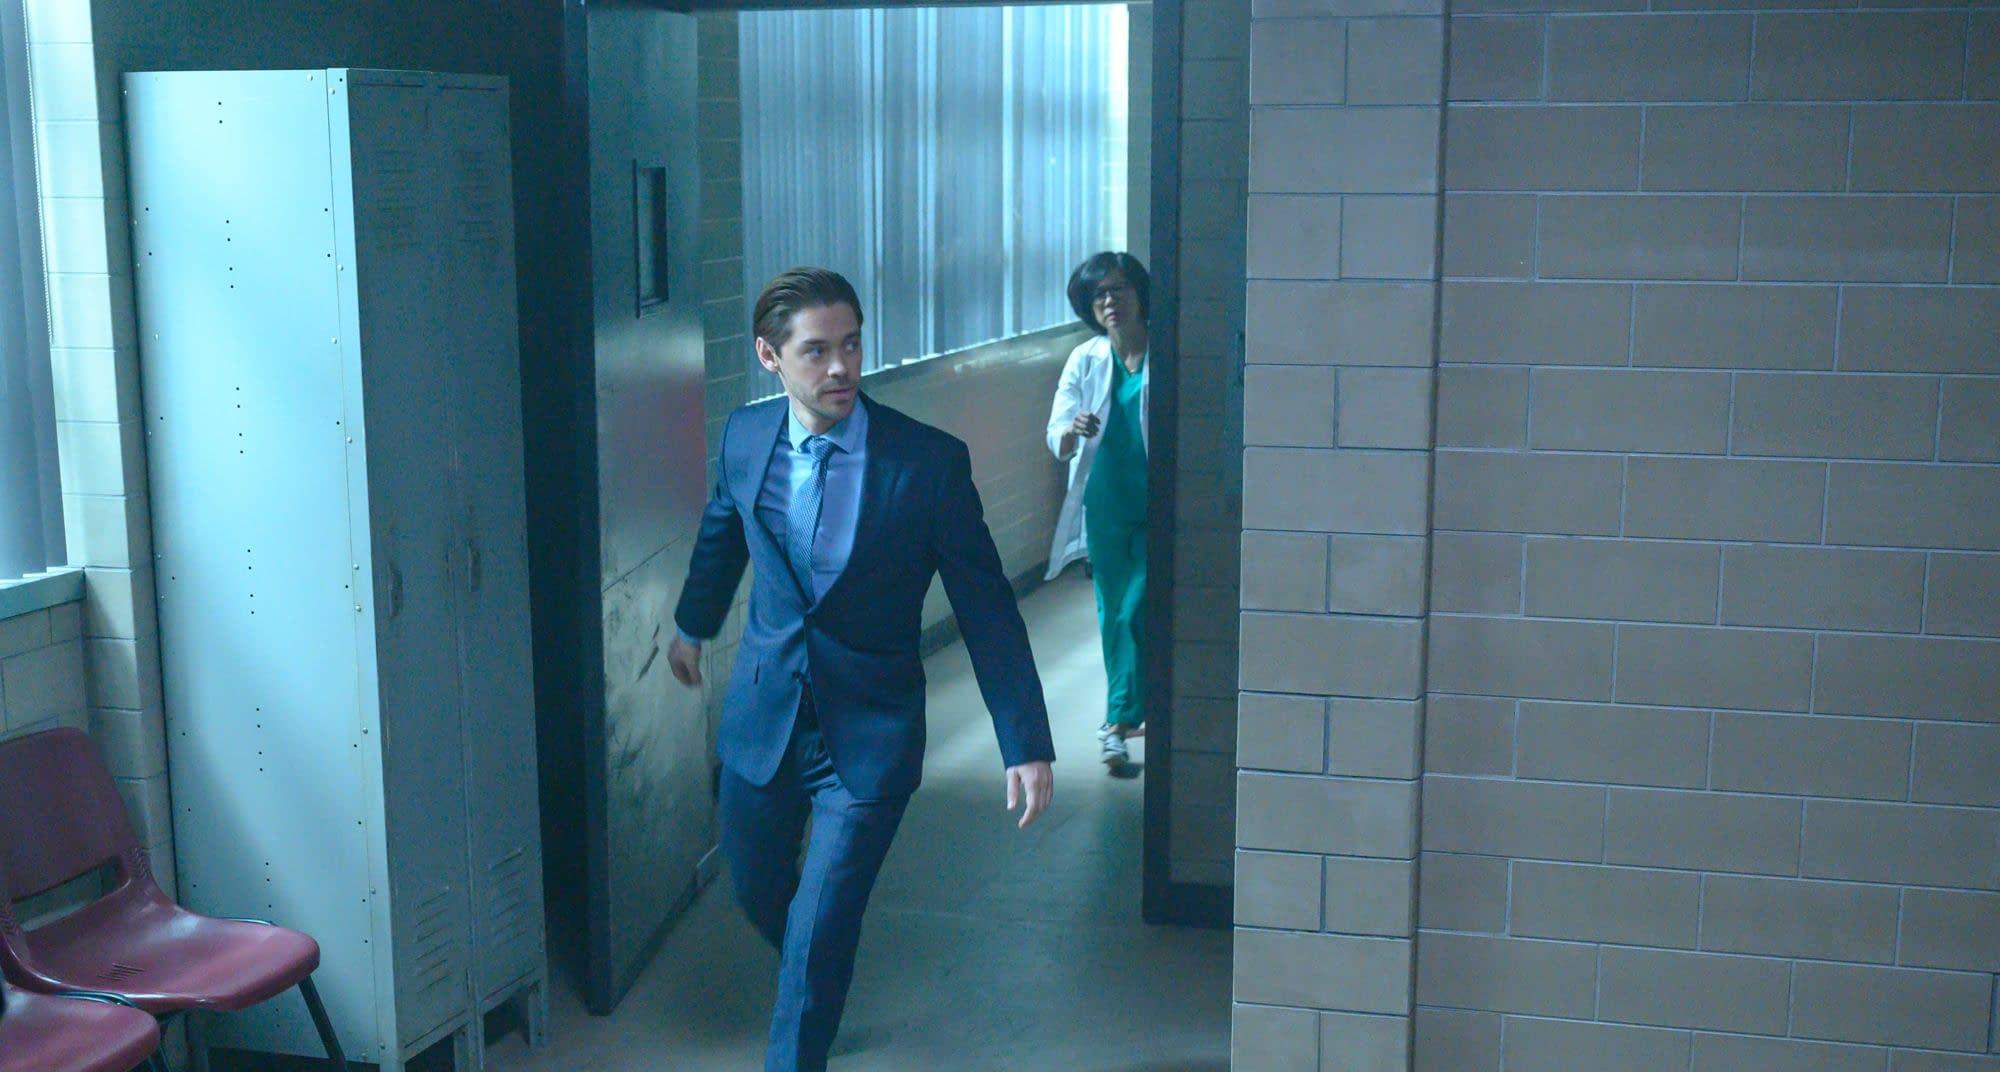 """Prodigal Son"" Season 1 ""Death's Door"": Bright & Edrisa Bond Over Formaldehyde [PREVIEW]"